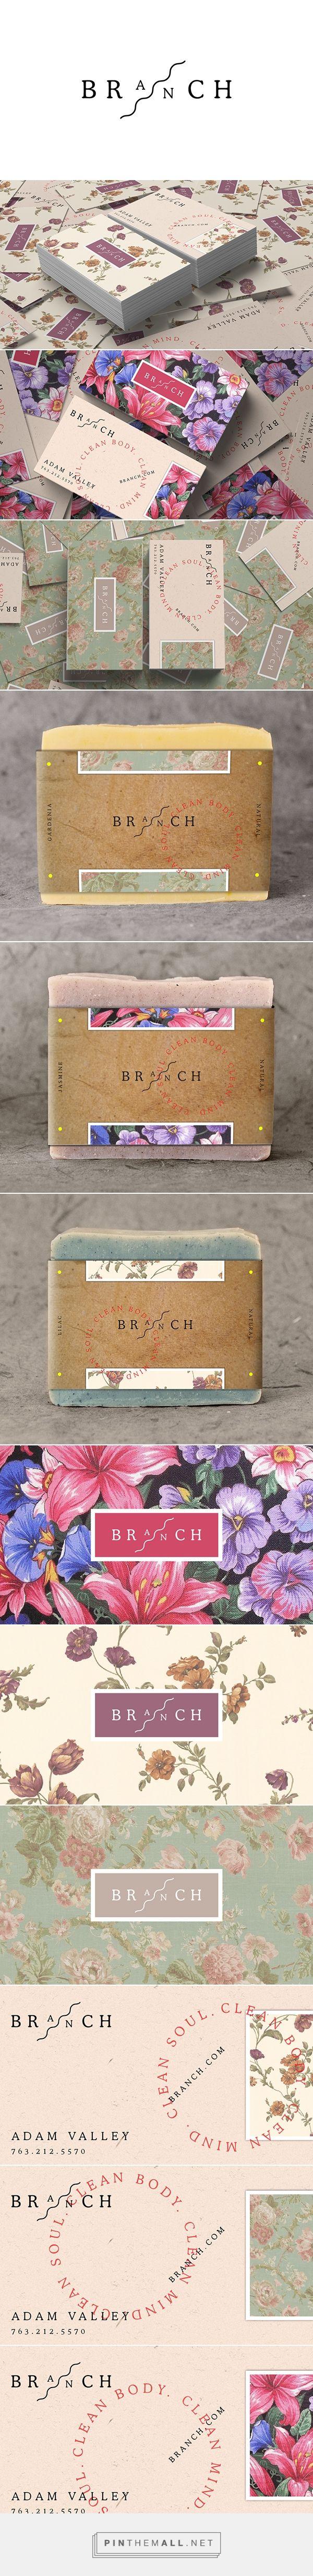 Branch Soap on Behance | Fivestar Branding – Design and Branding Agency & Inspiration Gallery